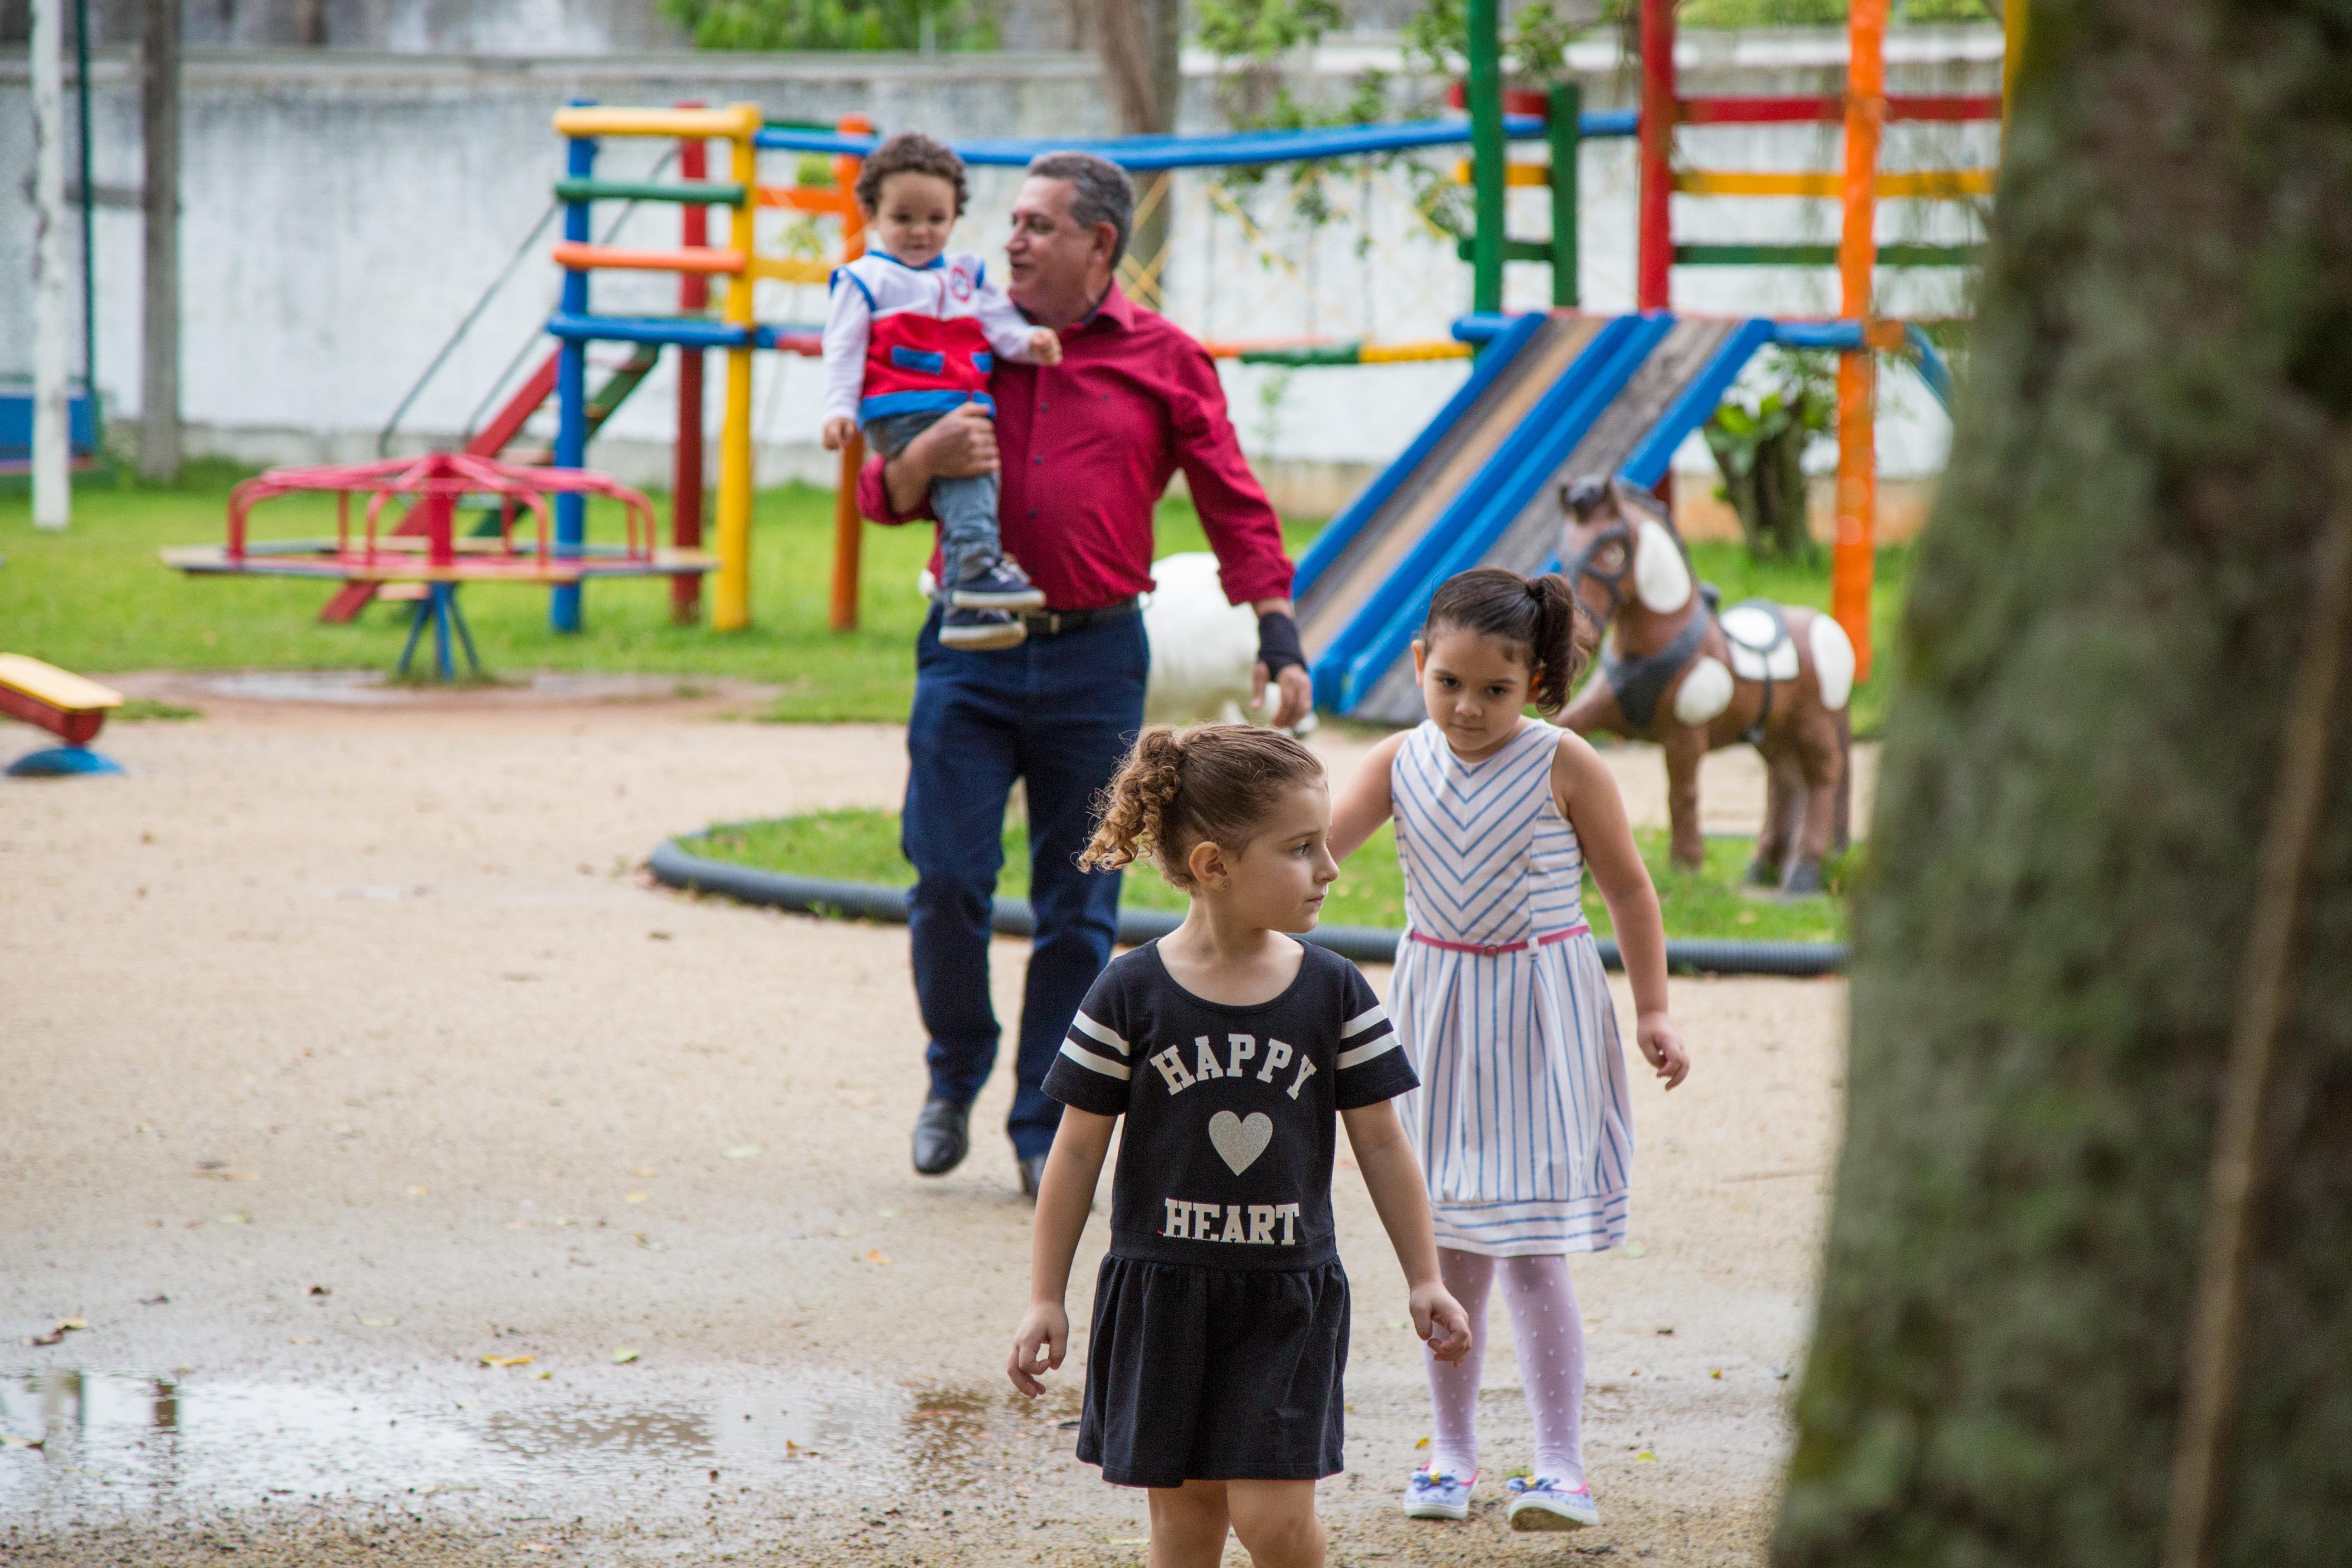 Festa‐Infantil‐Florianopolis‐Ana‐Marmo‐FotografiaFesta‐Infantil‐Florianopolis‐Ana‐Marmo‐Fotografia191A0600